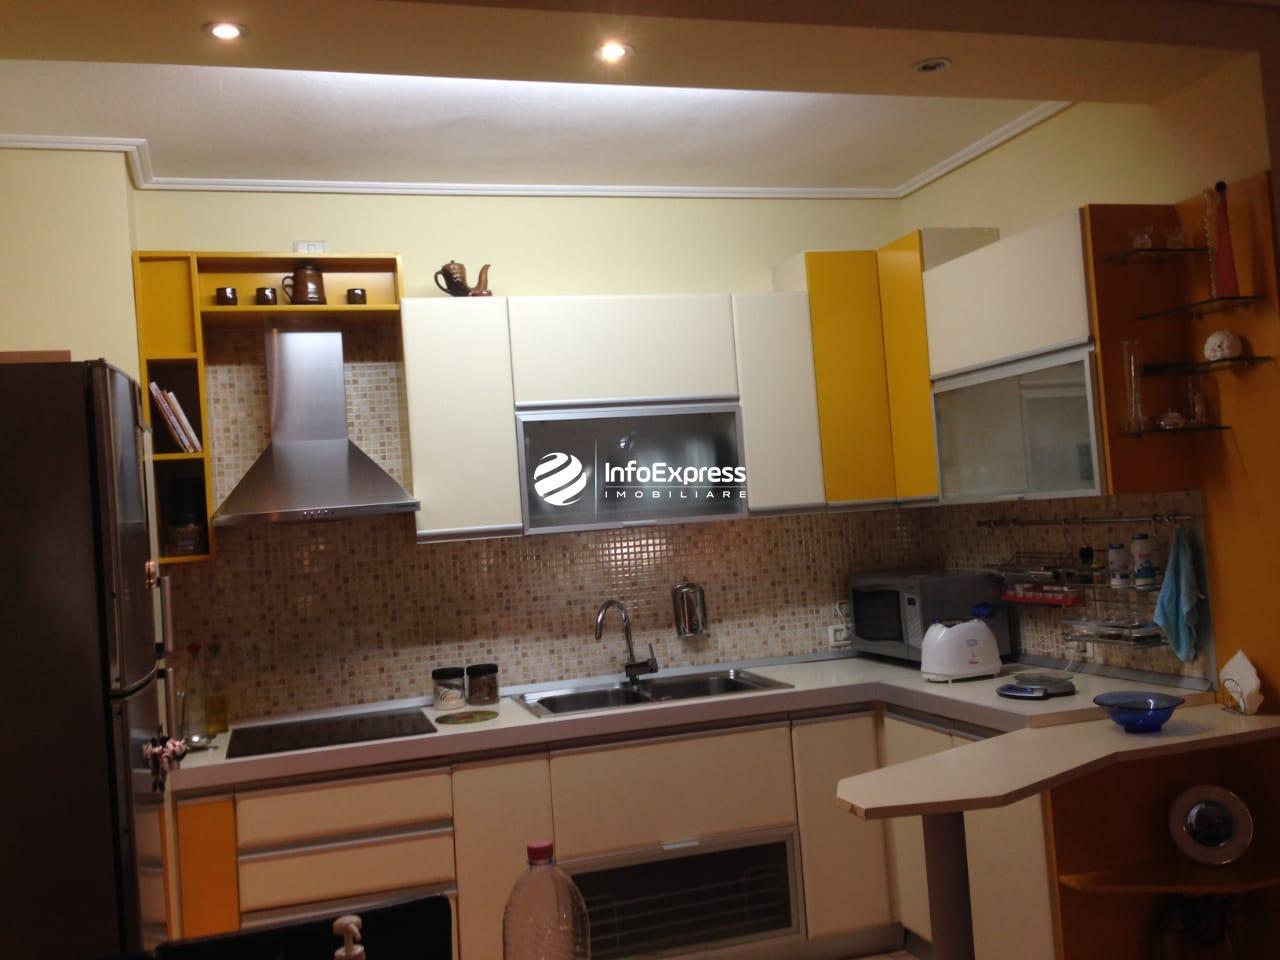 TRR-0618-1347 Jepet me qera apartament 2+1 ne Komunen e Parisit